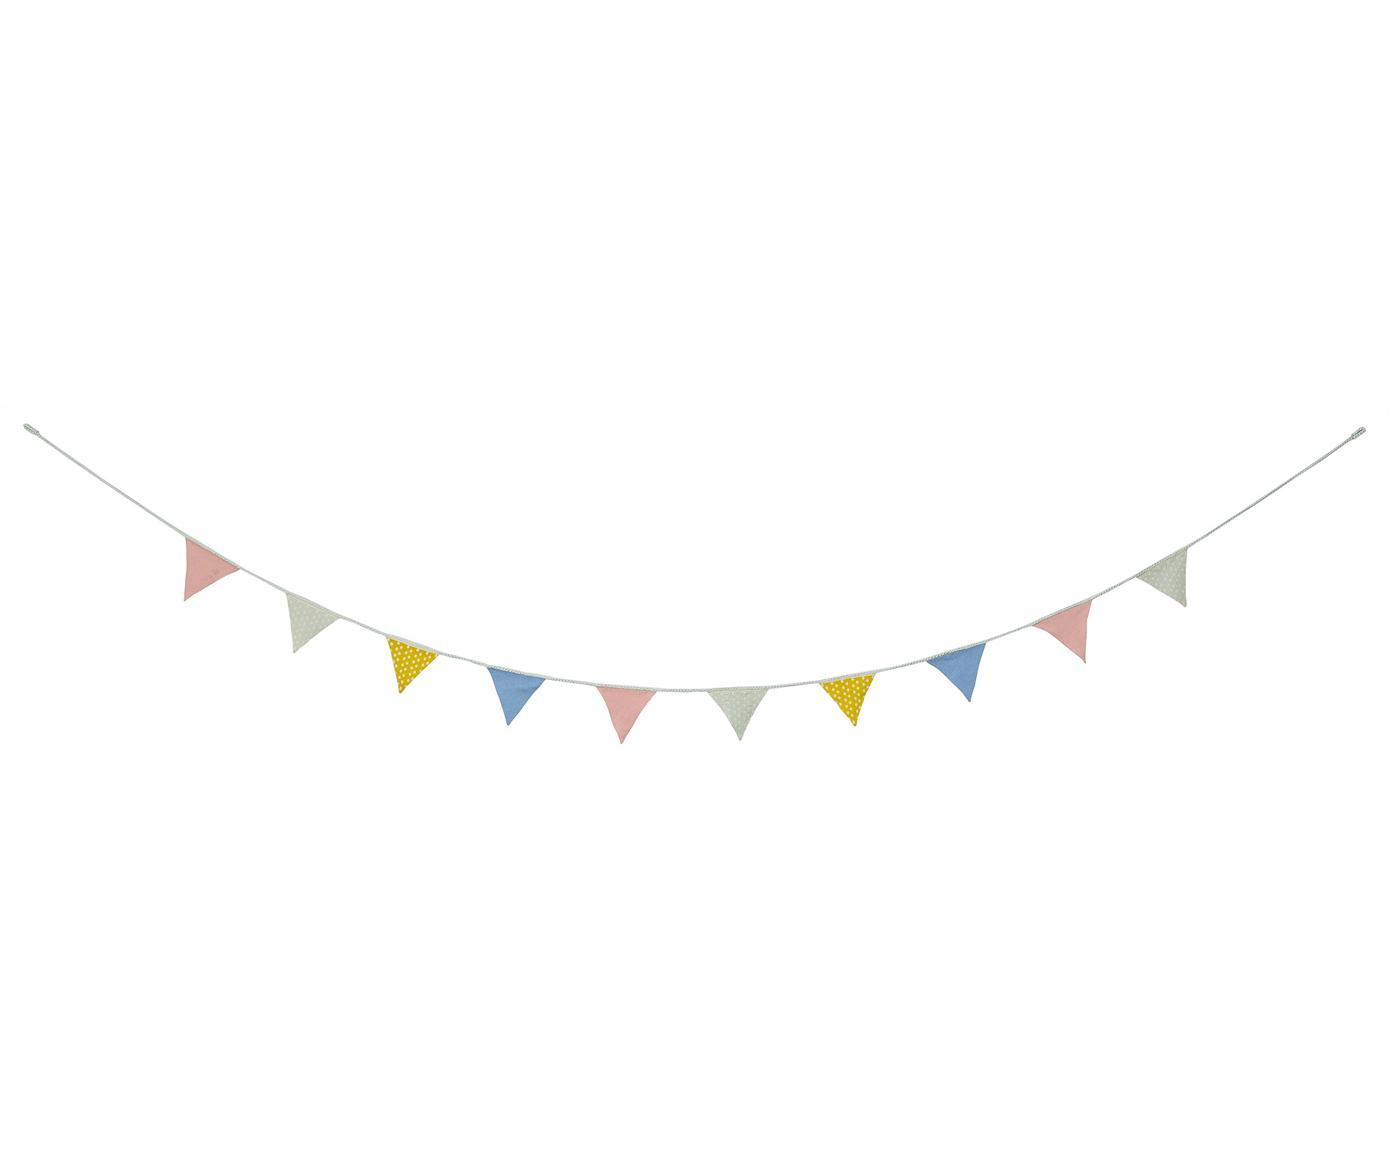 Girlande Triangles, 300 cm, Baumwolle, Mehrfarbig, 12 x 12 cm